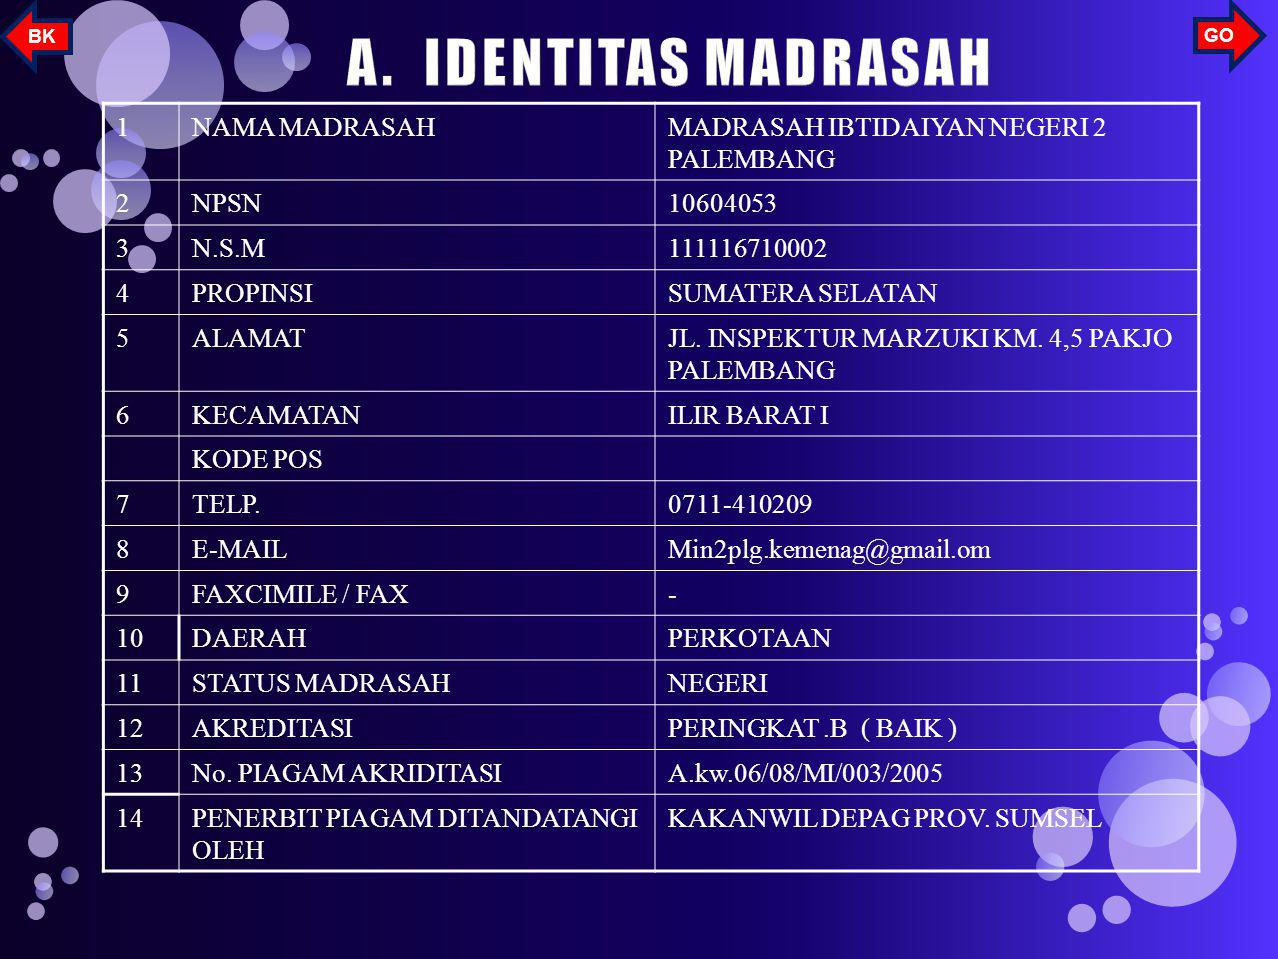 A. IDENTITAS MADRASAH 1 NAMA MADRASAH